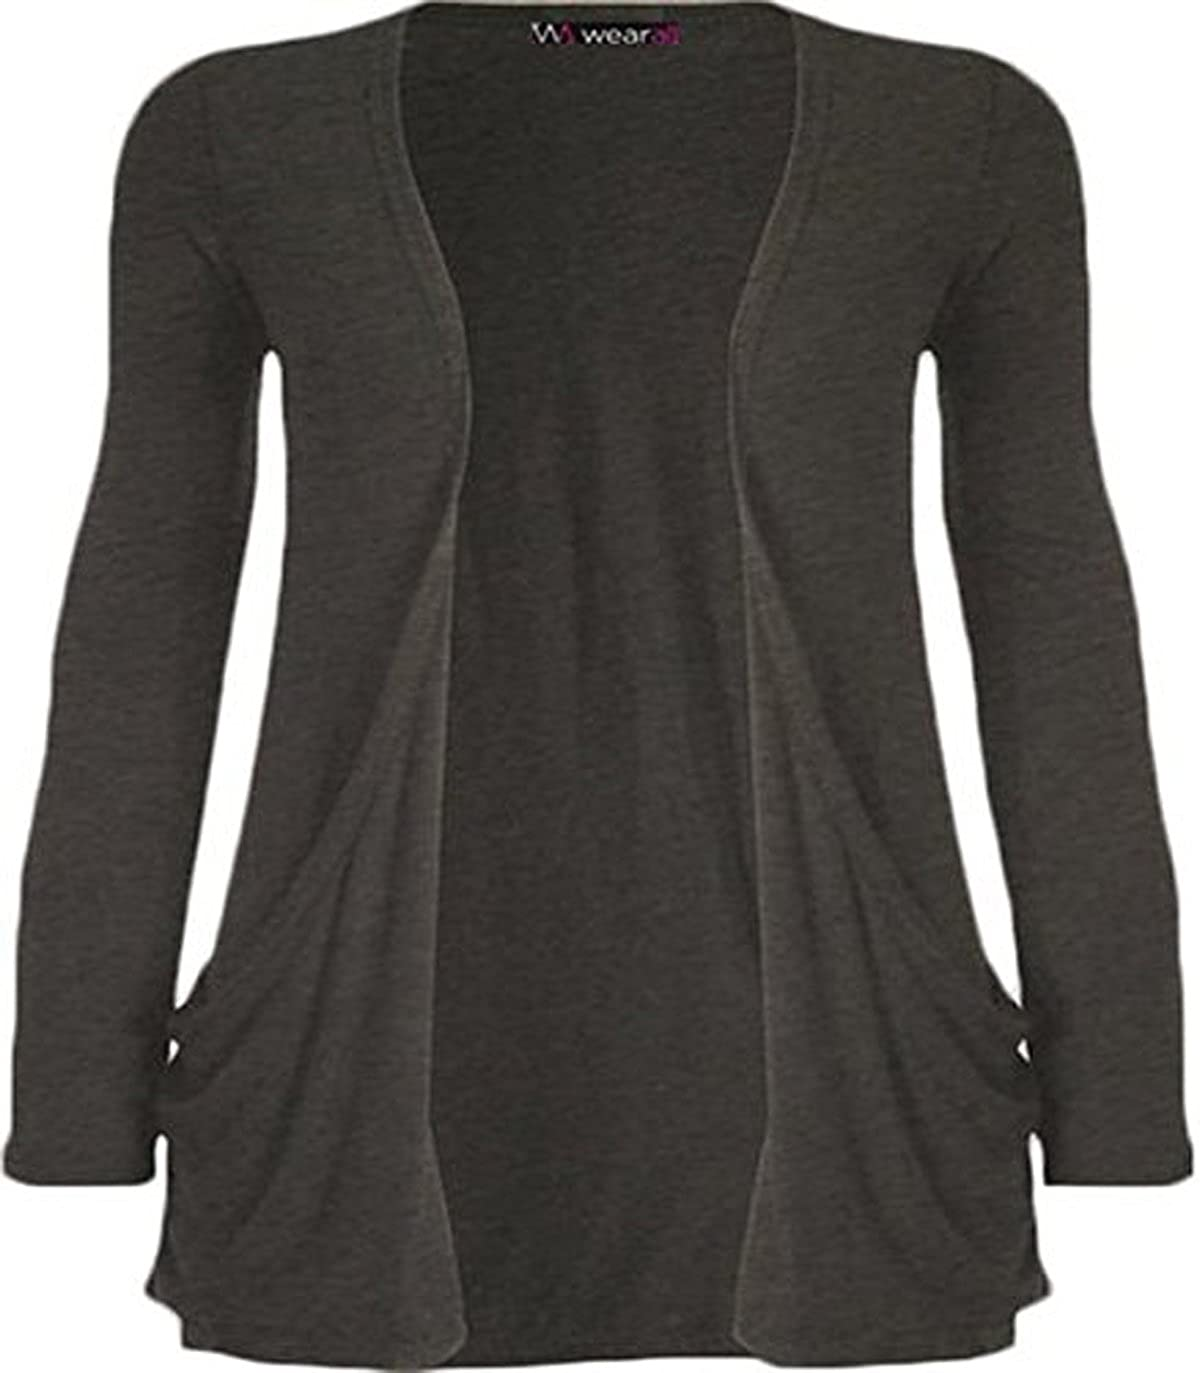 Amazon.com: WearAll Women's Long Sleeve Pocket Cardigan: Clothing